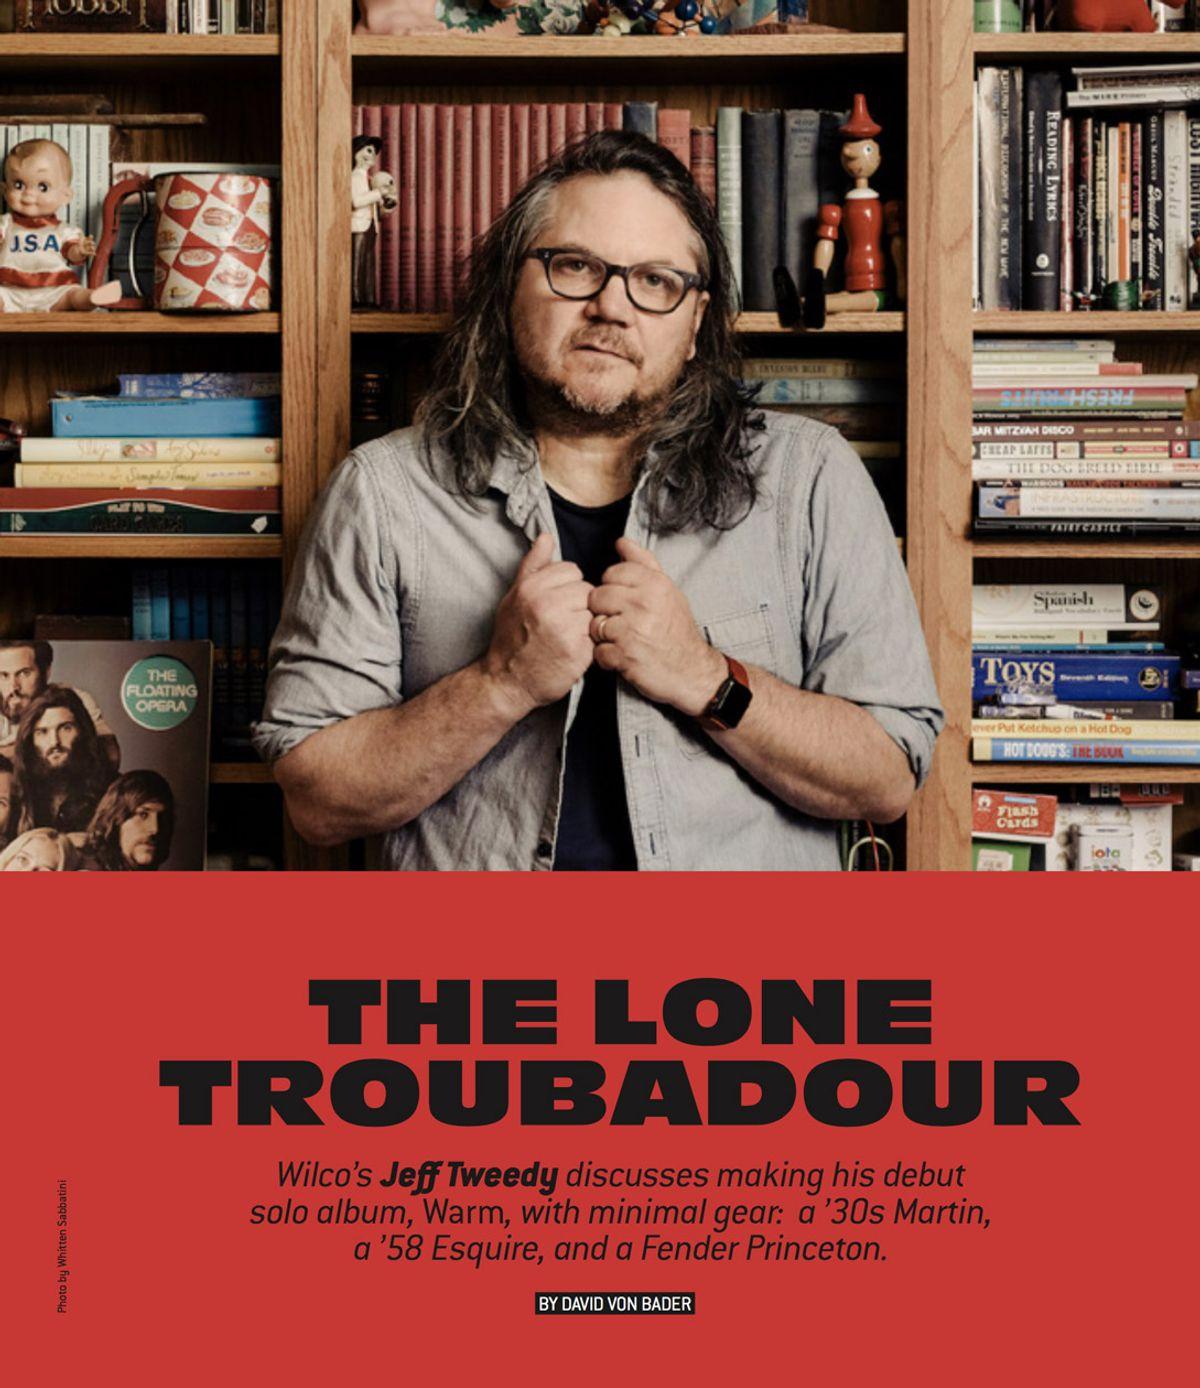 Jeff Tweedy: The Lone Troubadour